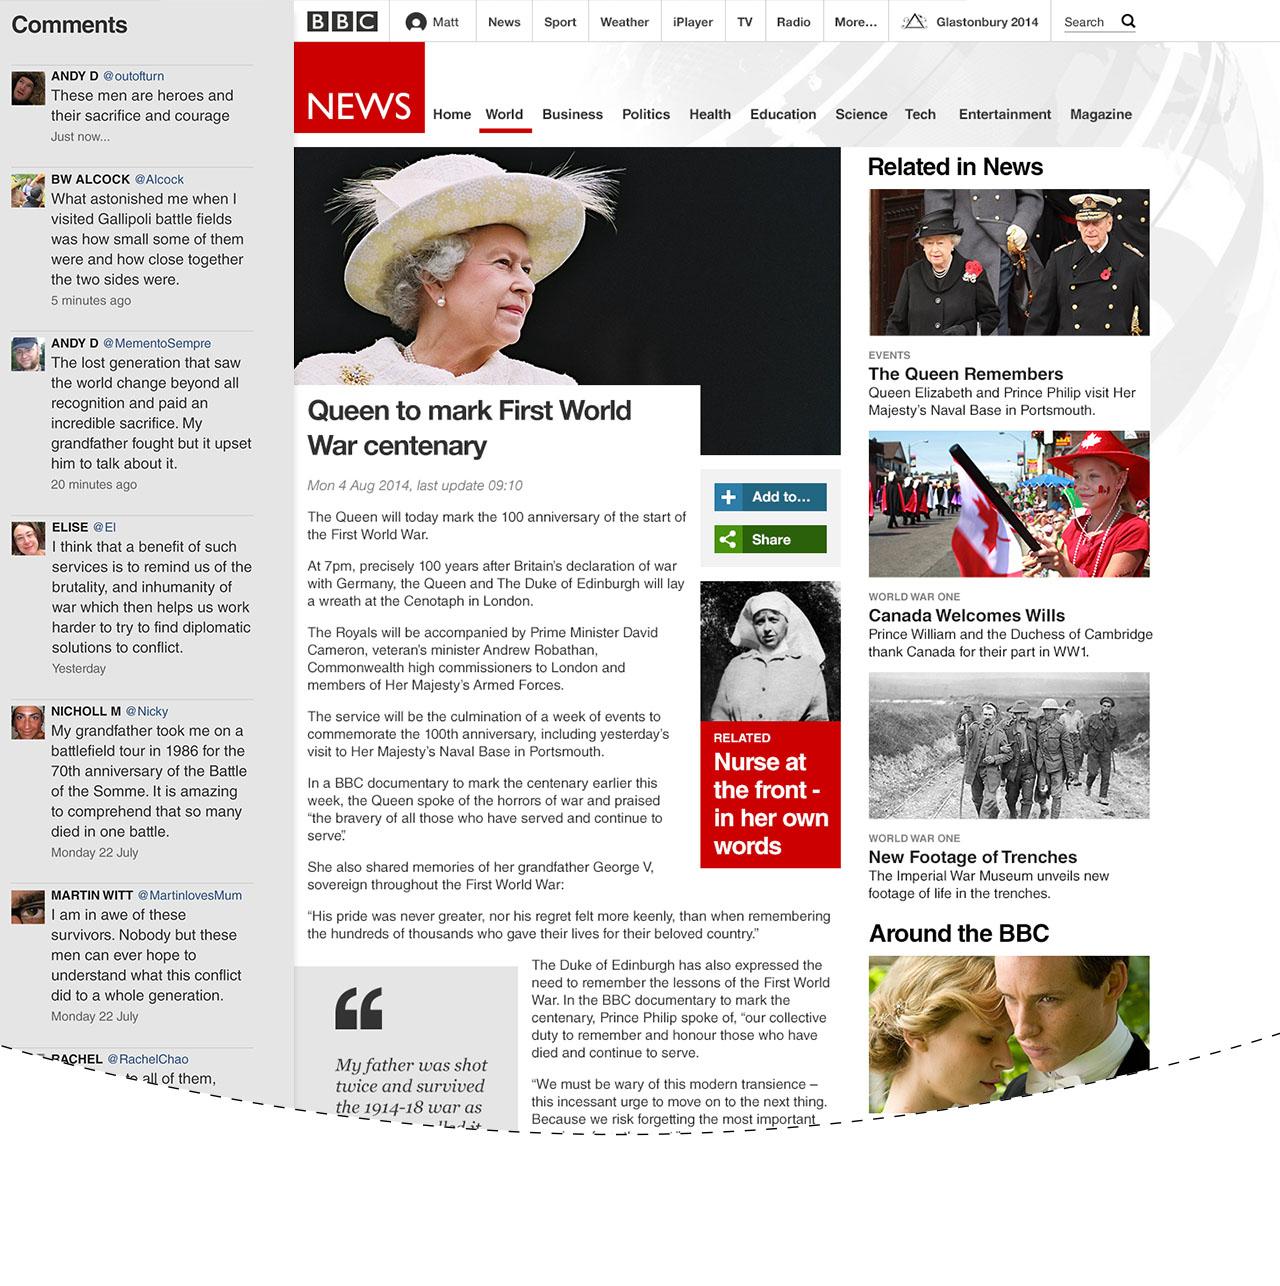 news page 1280